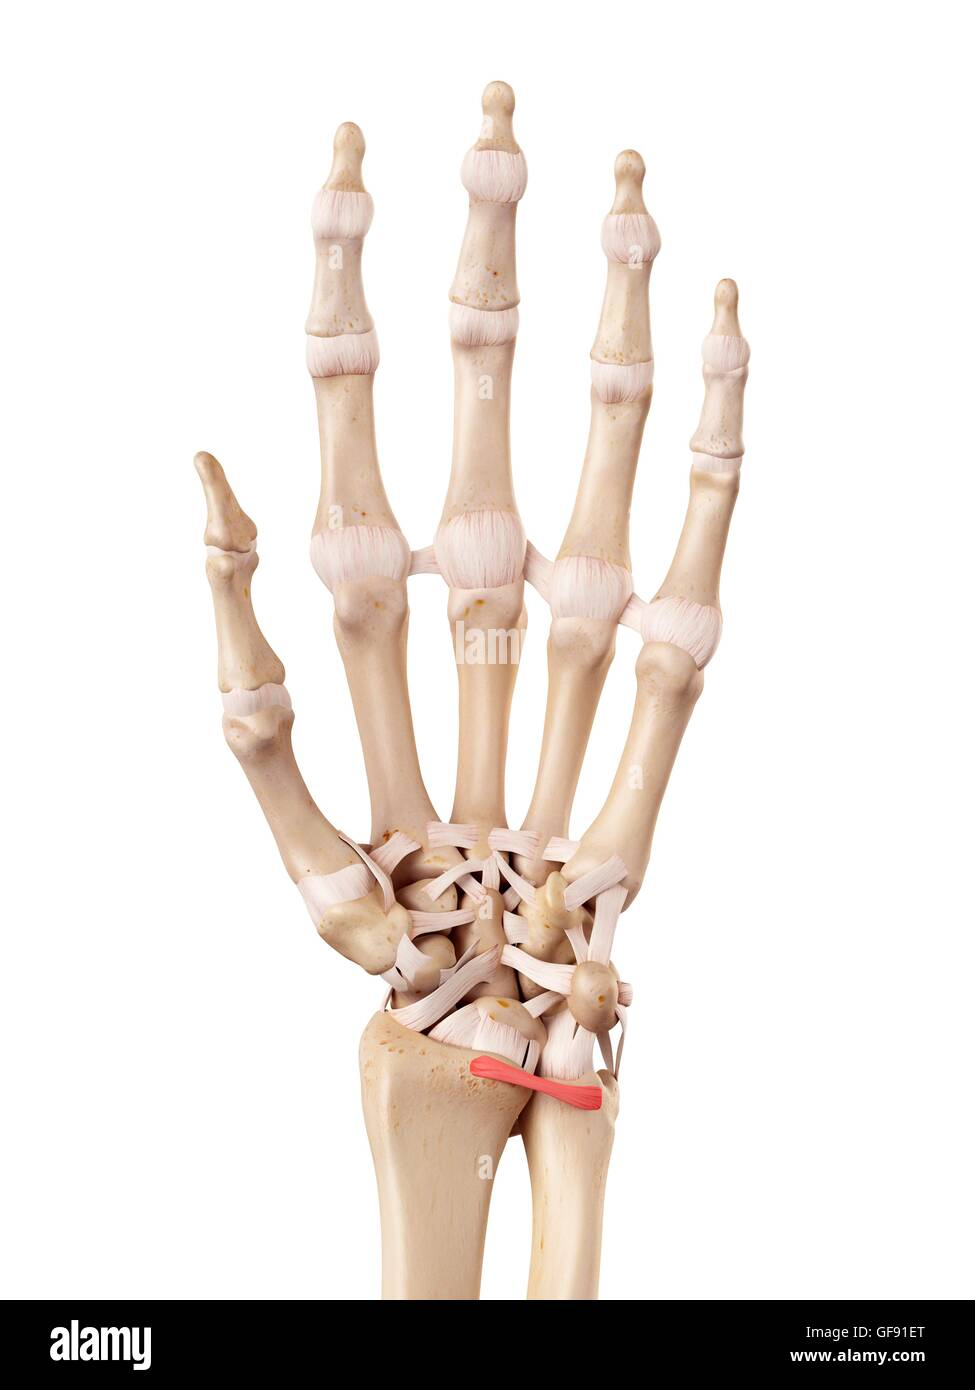 Palmar Ligaments Stock Photos & Palmar Ligaments Stock Images - Alamy